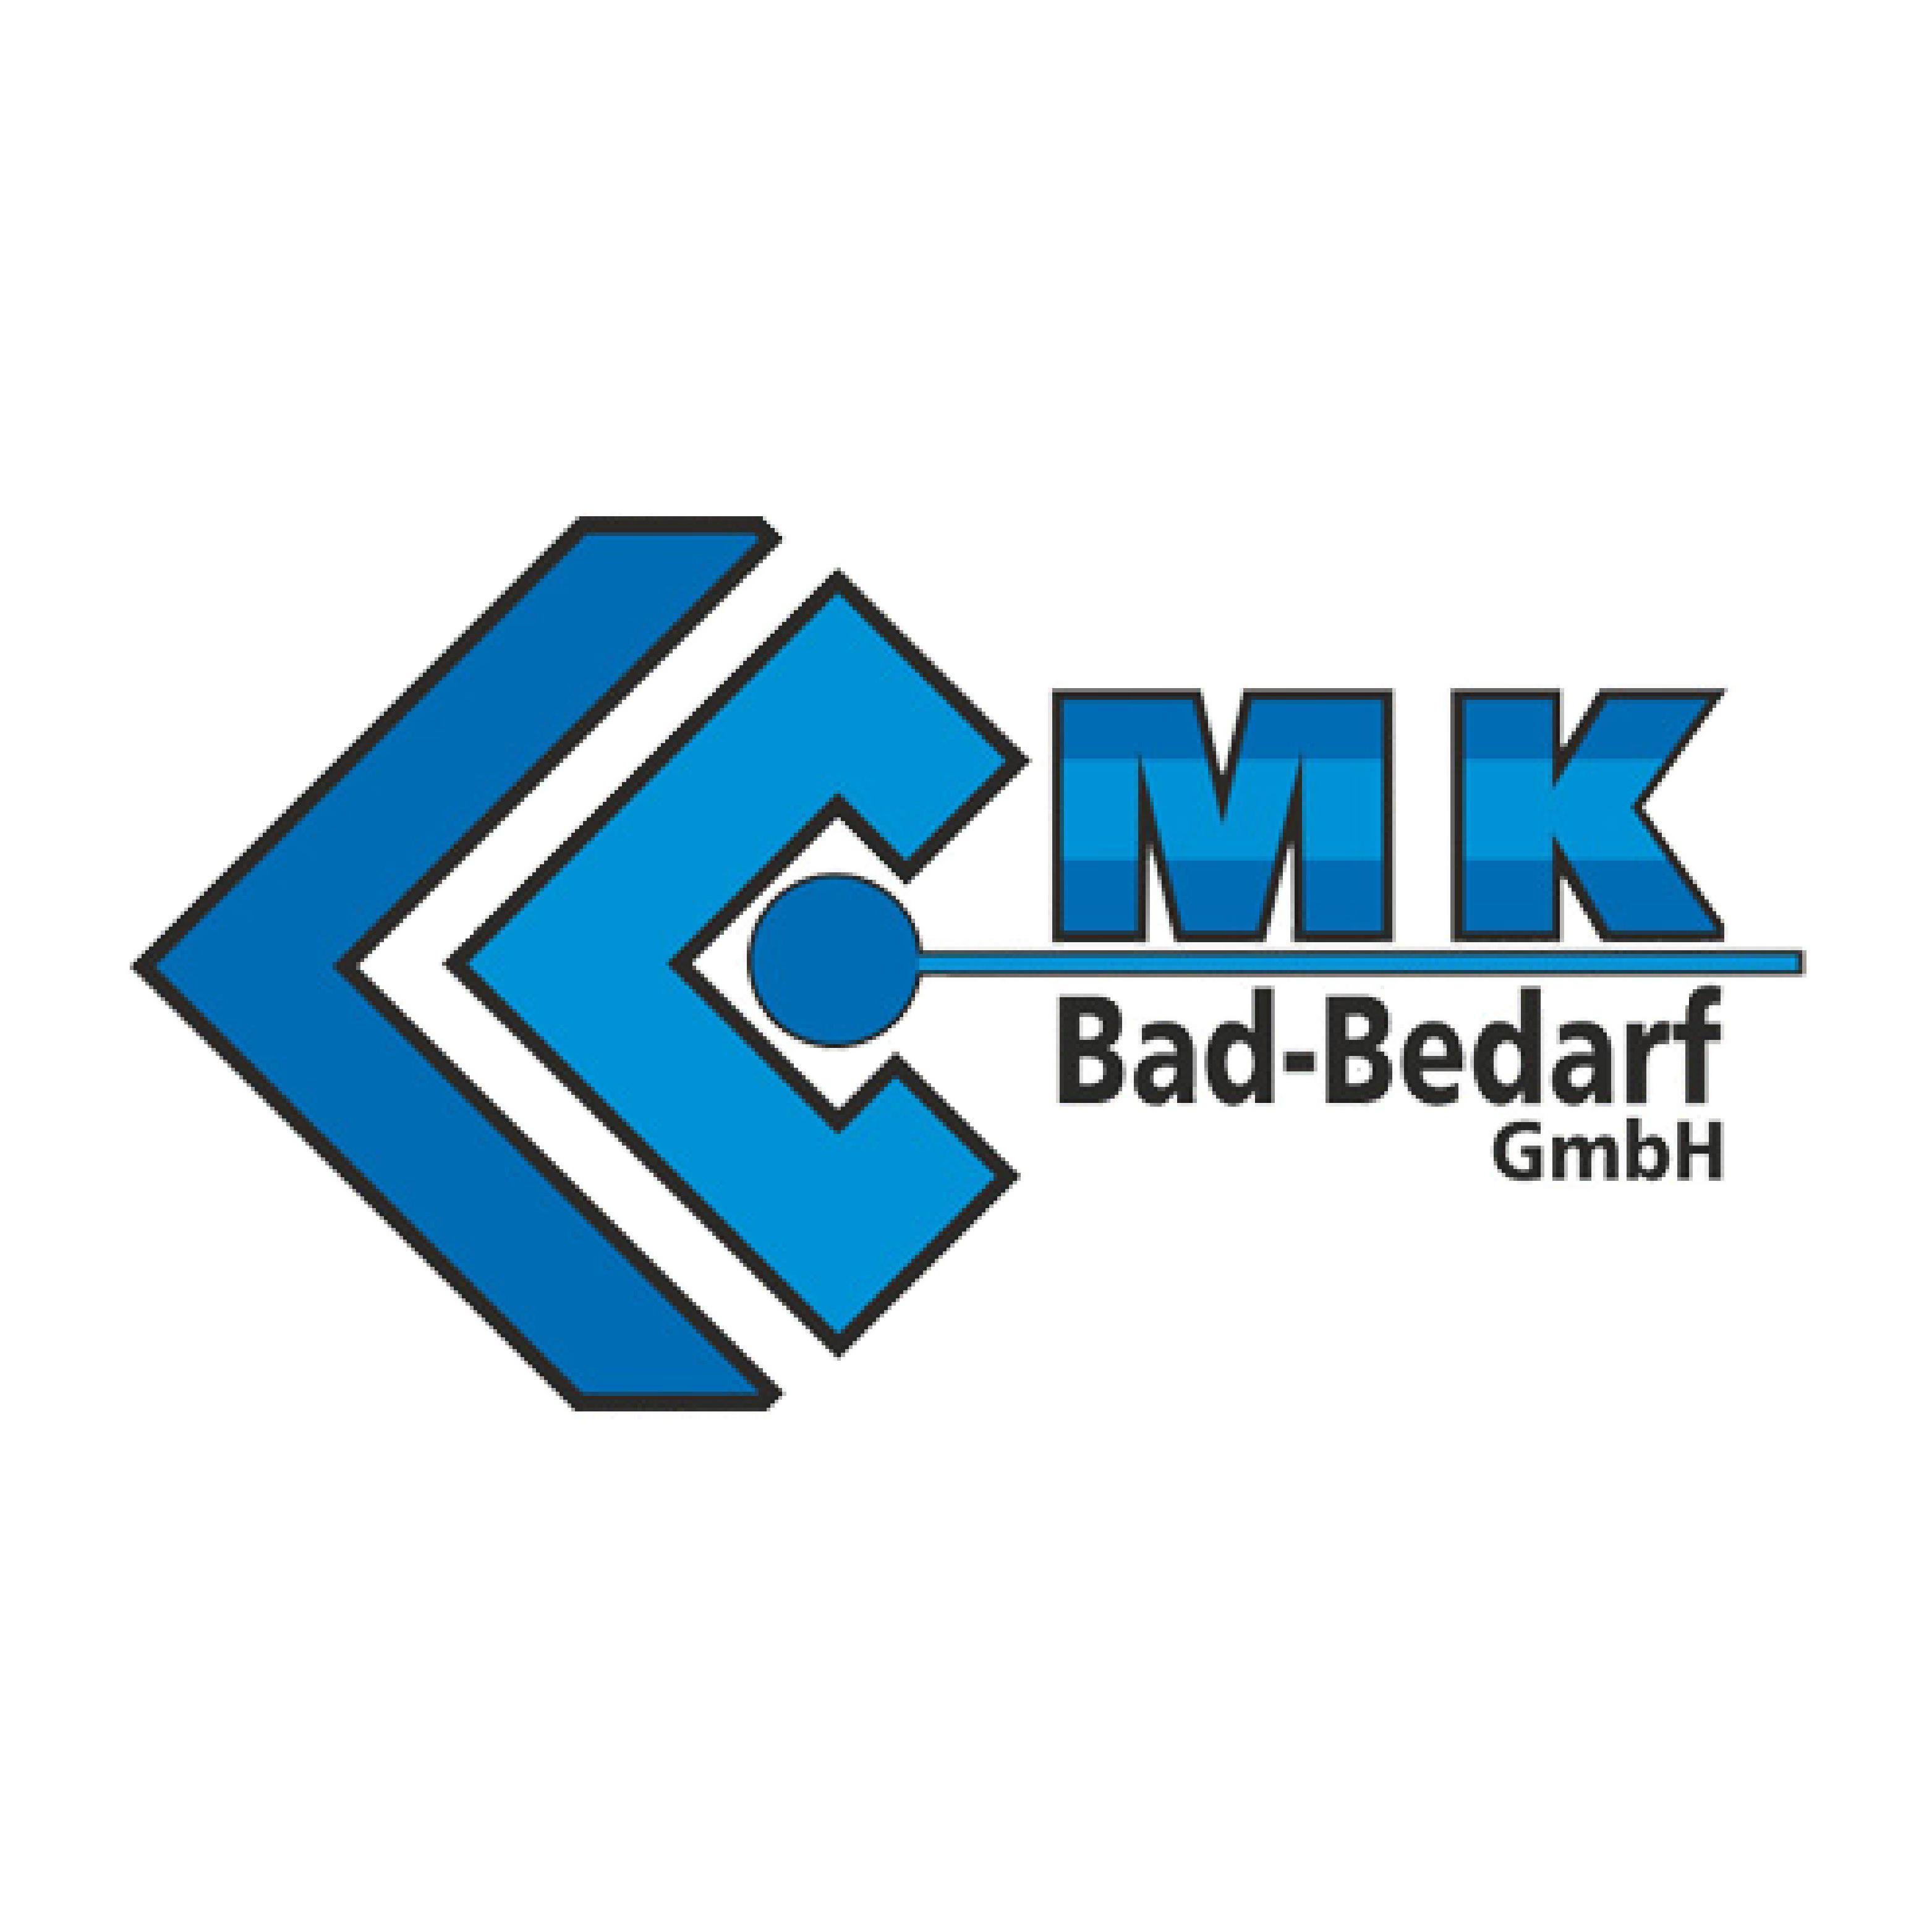 MK Bad Bedarf GmbH